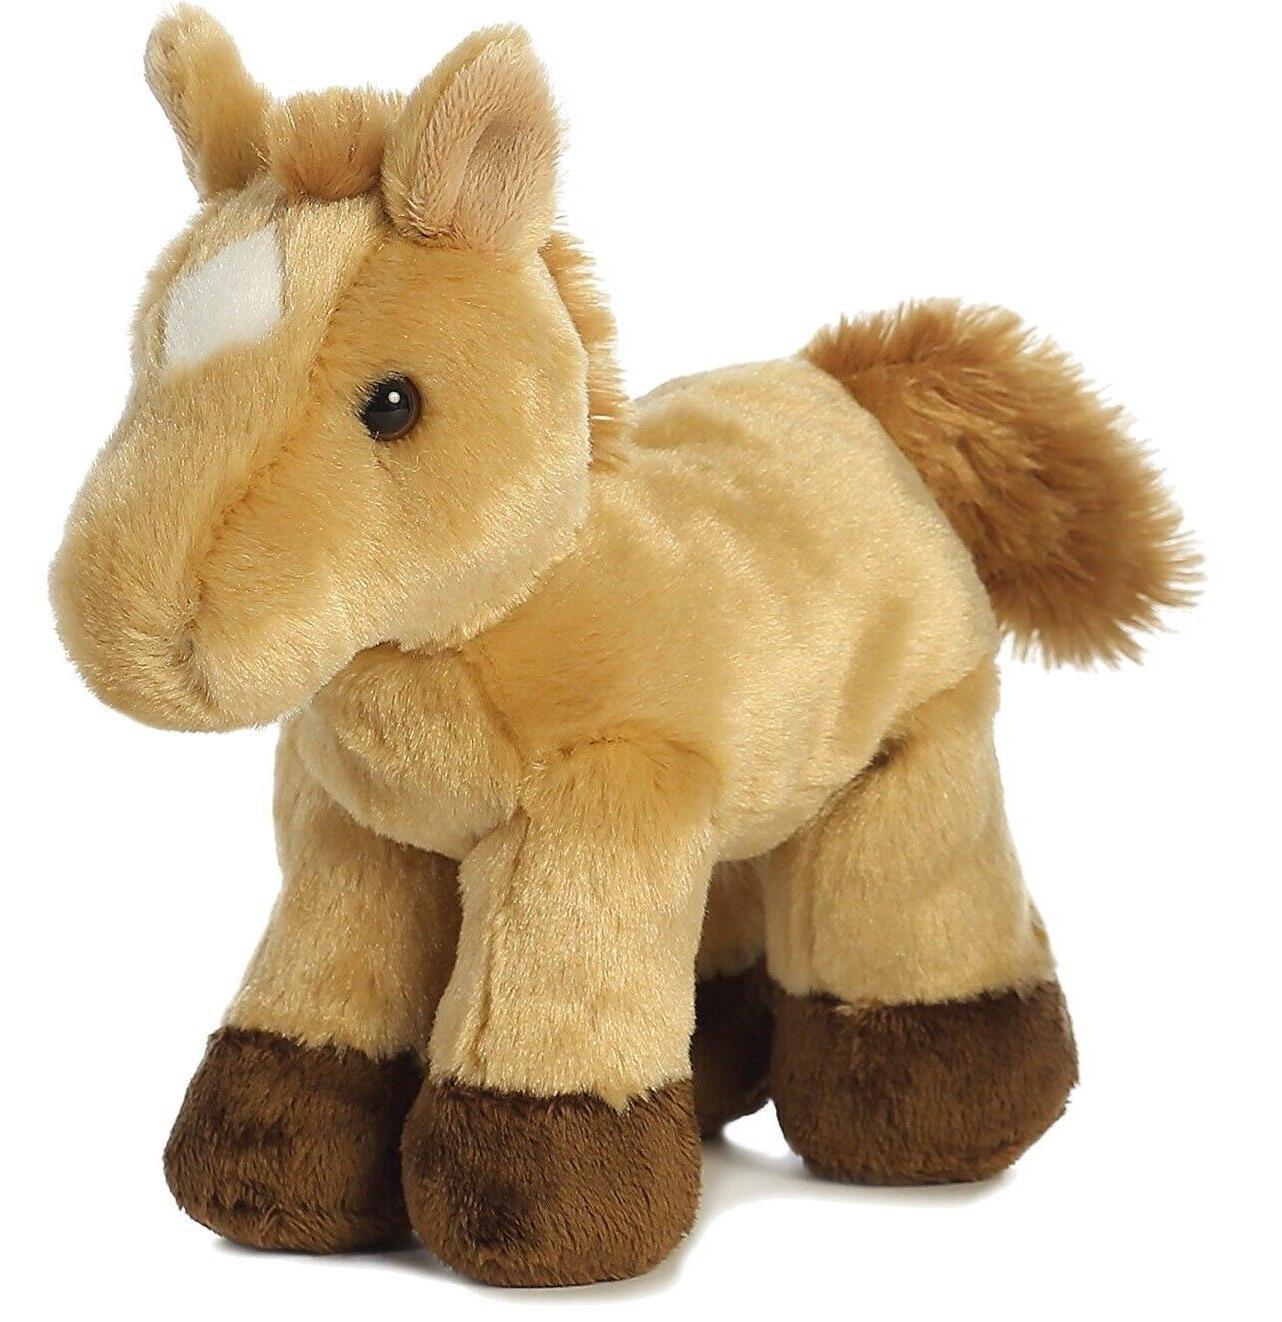 8 Inch Mini Horse Plush Stuffed Animal by Aurora & Adoption